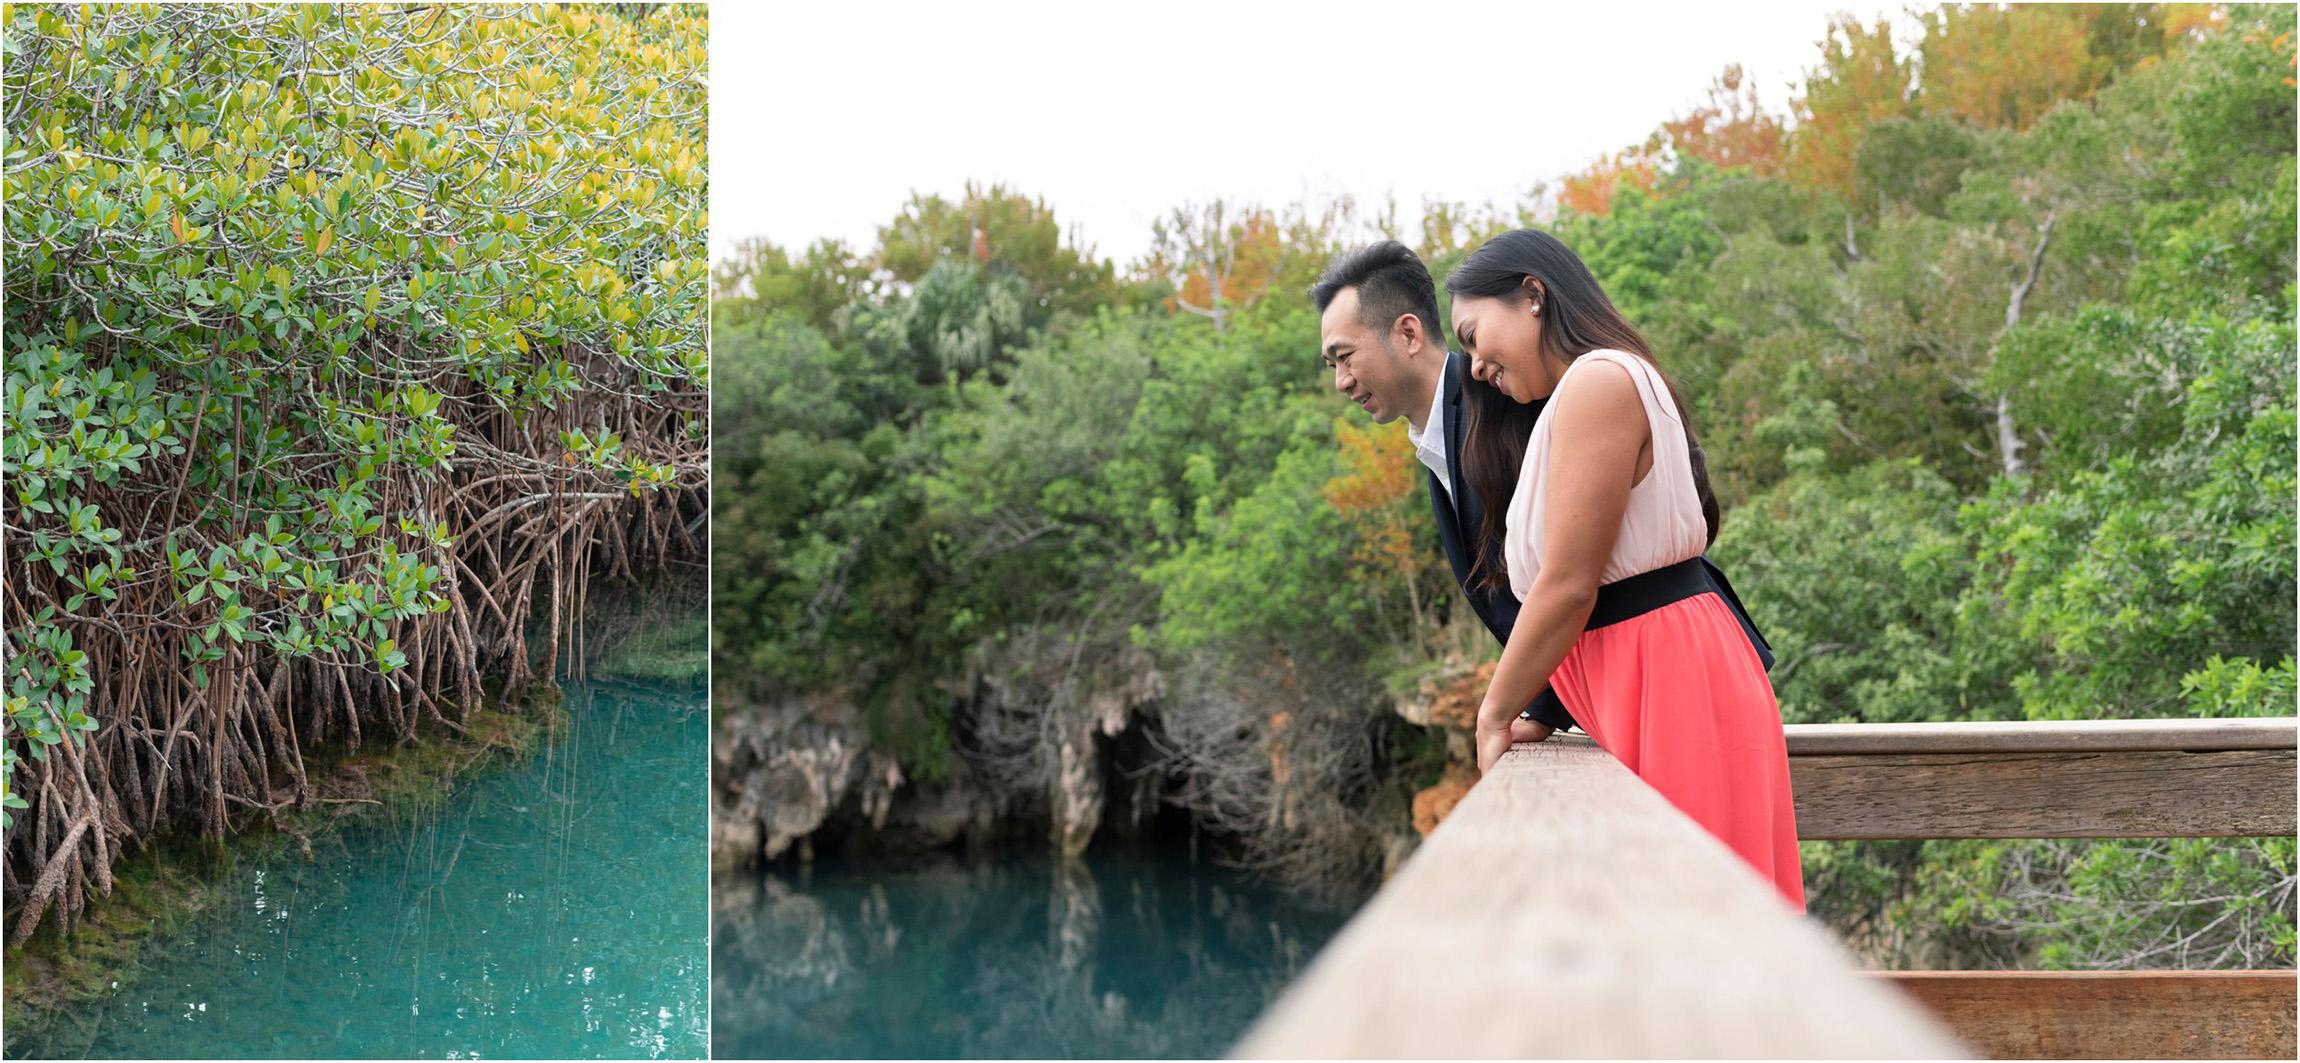 ©FianderFoto_Bermuda Engagement Photographer_Tom Moores Jungle_Owen_Chanson_011.jpg